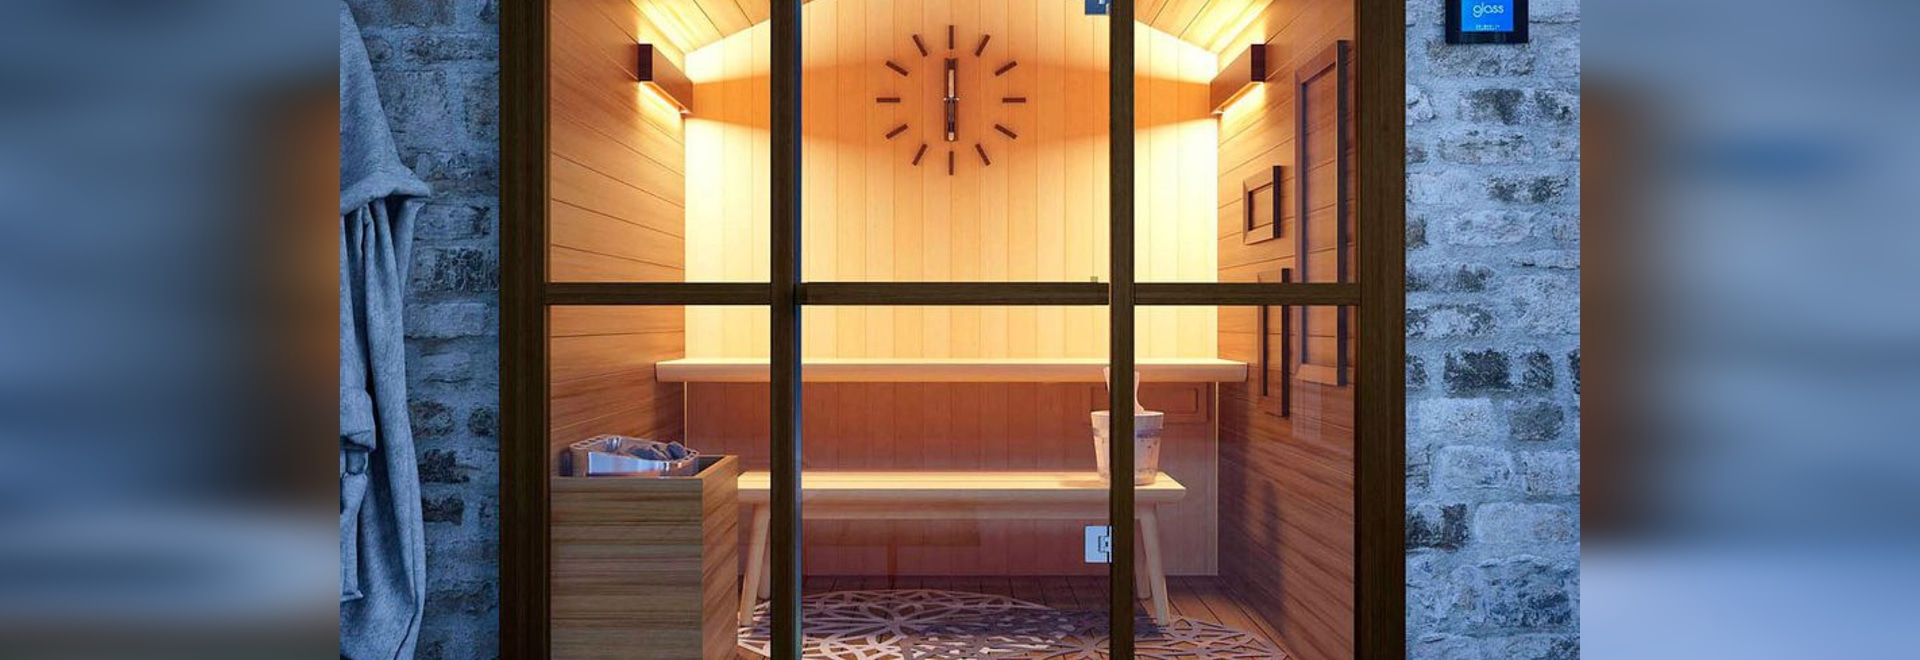 NEW: Finnish sauna by GLASS 1989